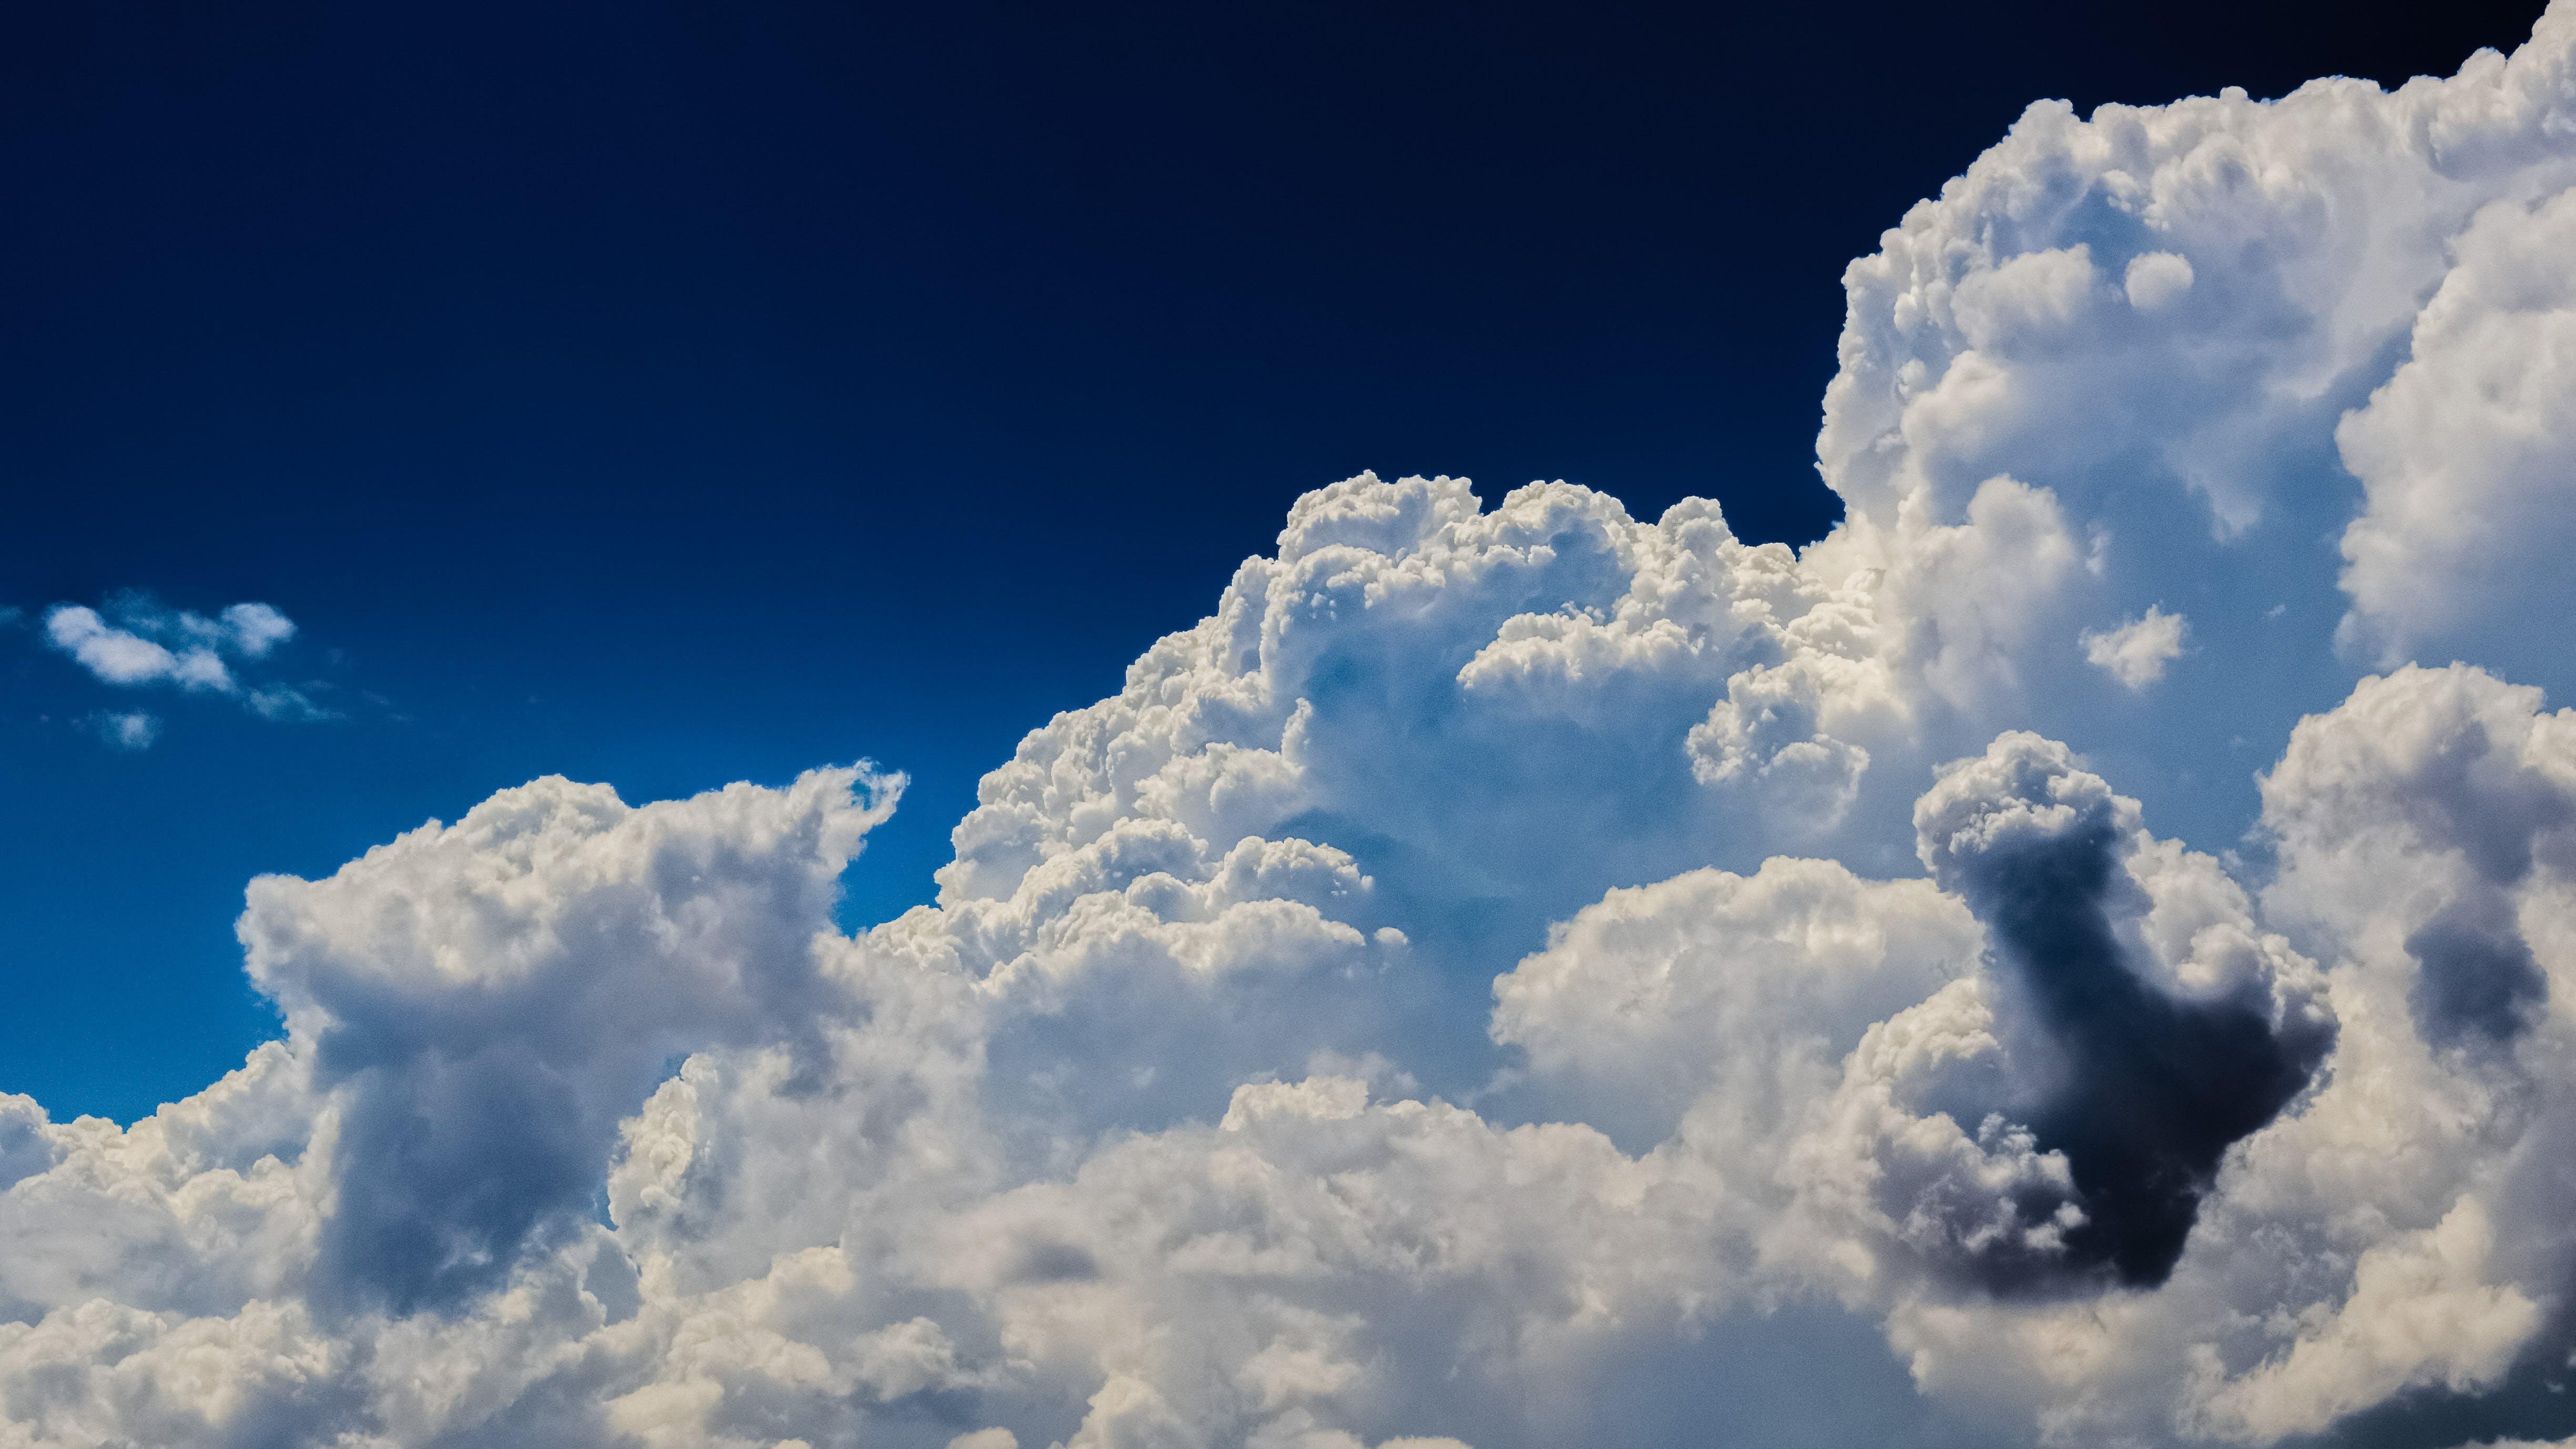 bewölkt, blau, blauer himmel